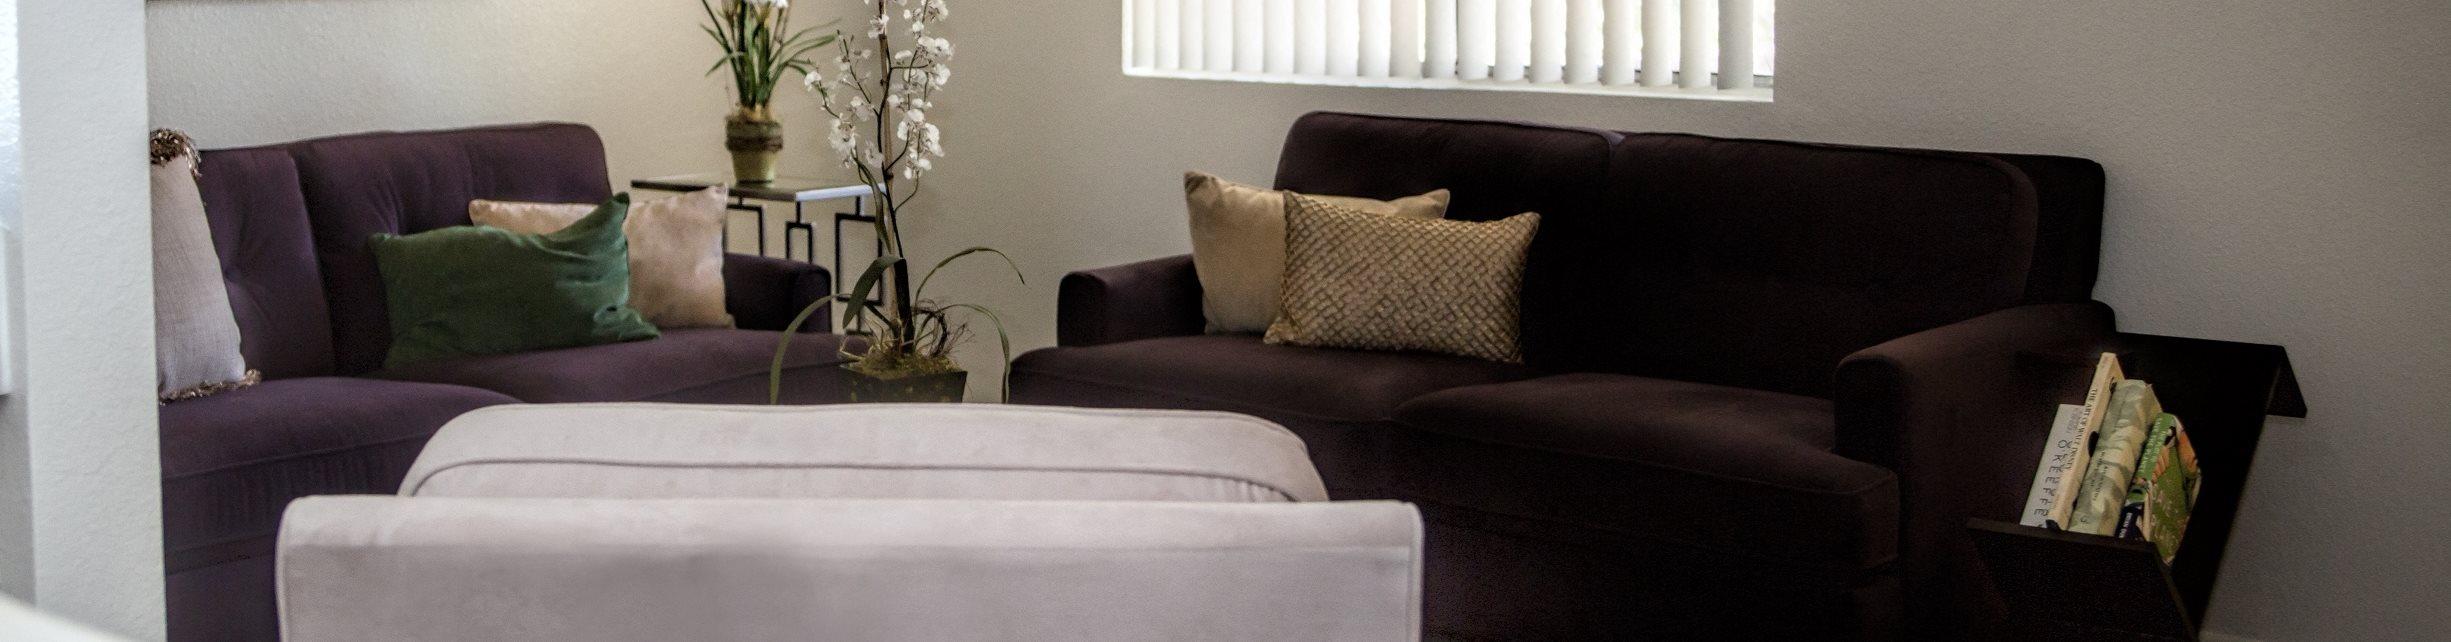 Spacious Living Room with sofasat Sagewood Apartments, Cottonwood, Arizona